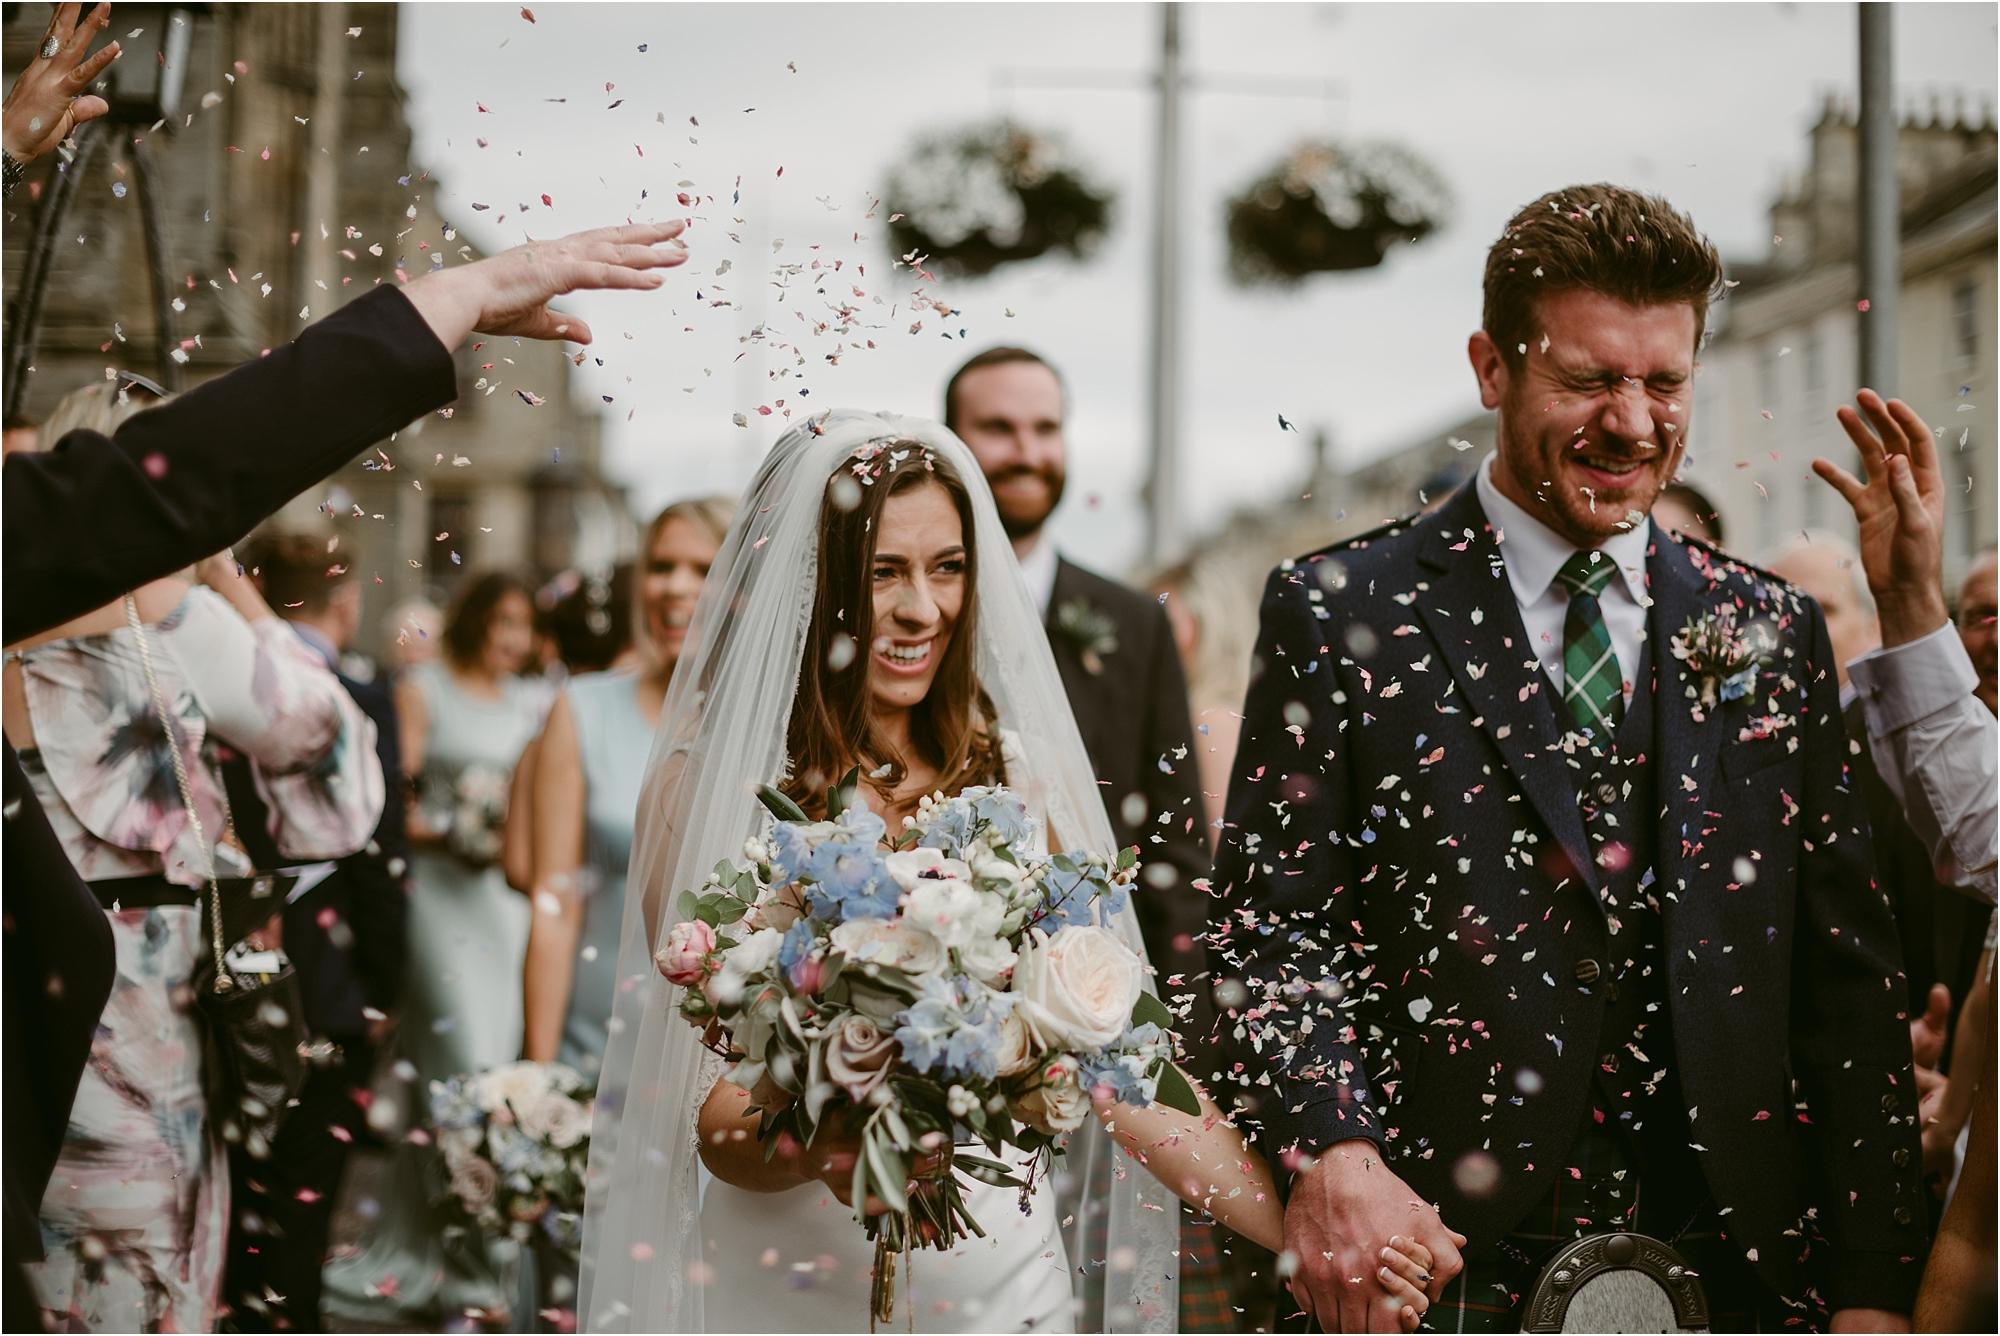 Scott+Joanna-Kinkell-Byre-wedding-fife-photography__0041.jpg